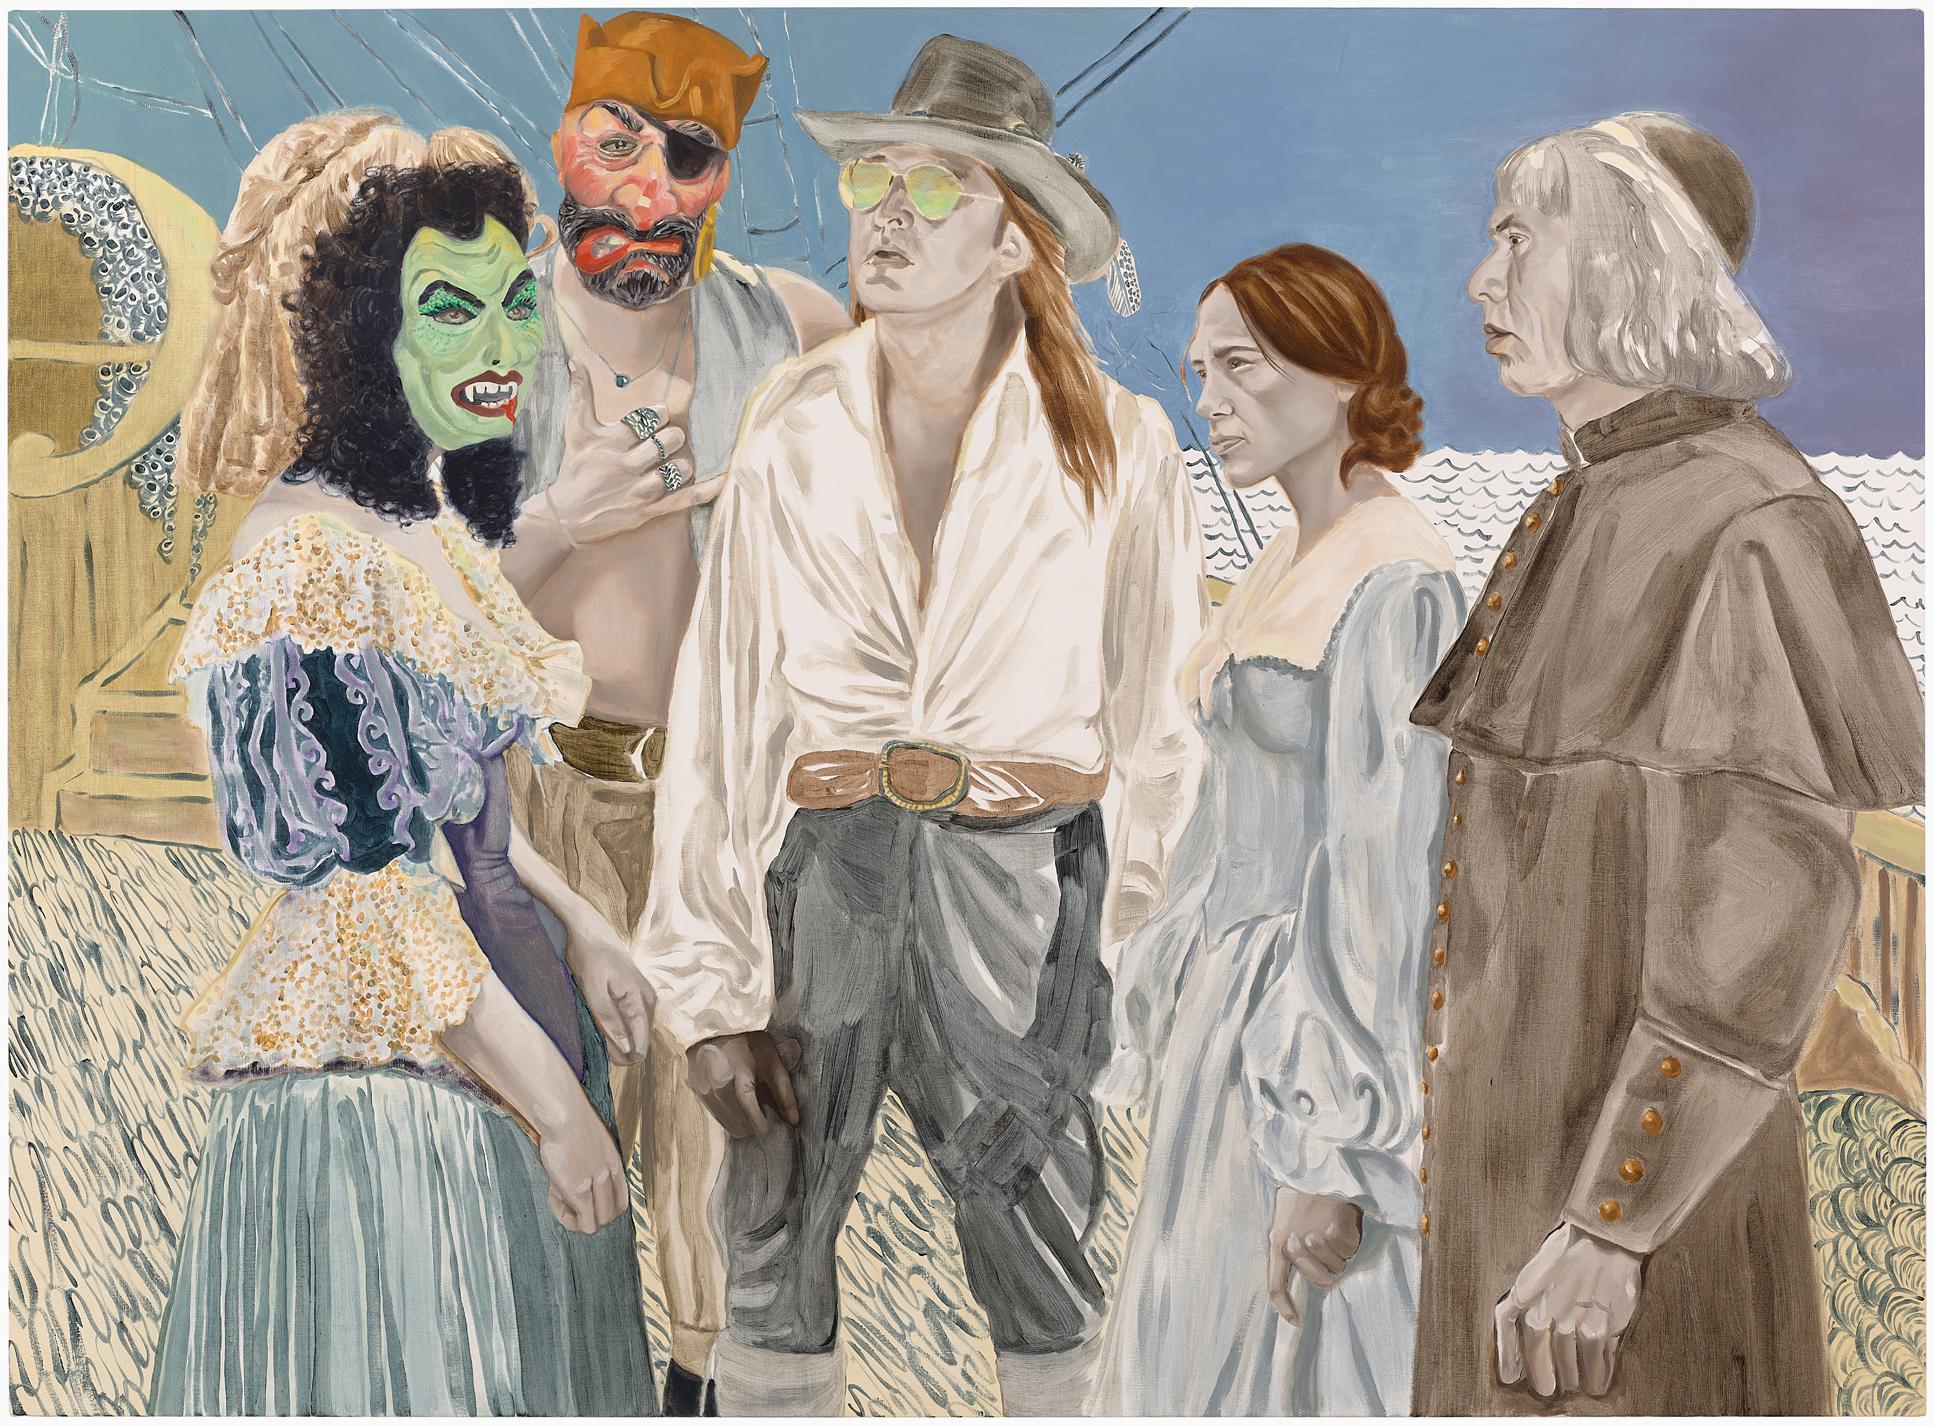 Katie Dorame Stow Away Voyage-Graham, Irene, Wes & the Rest